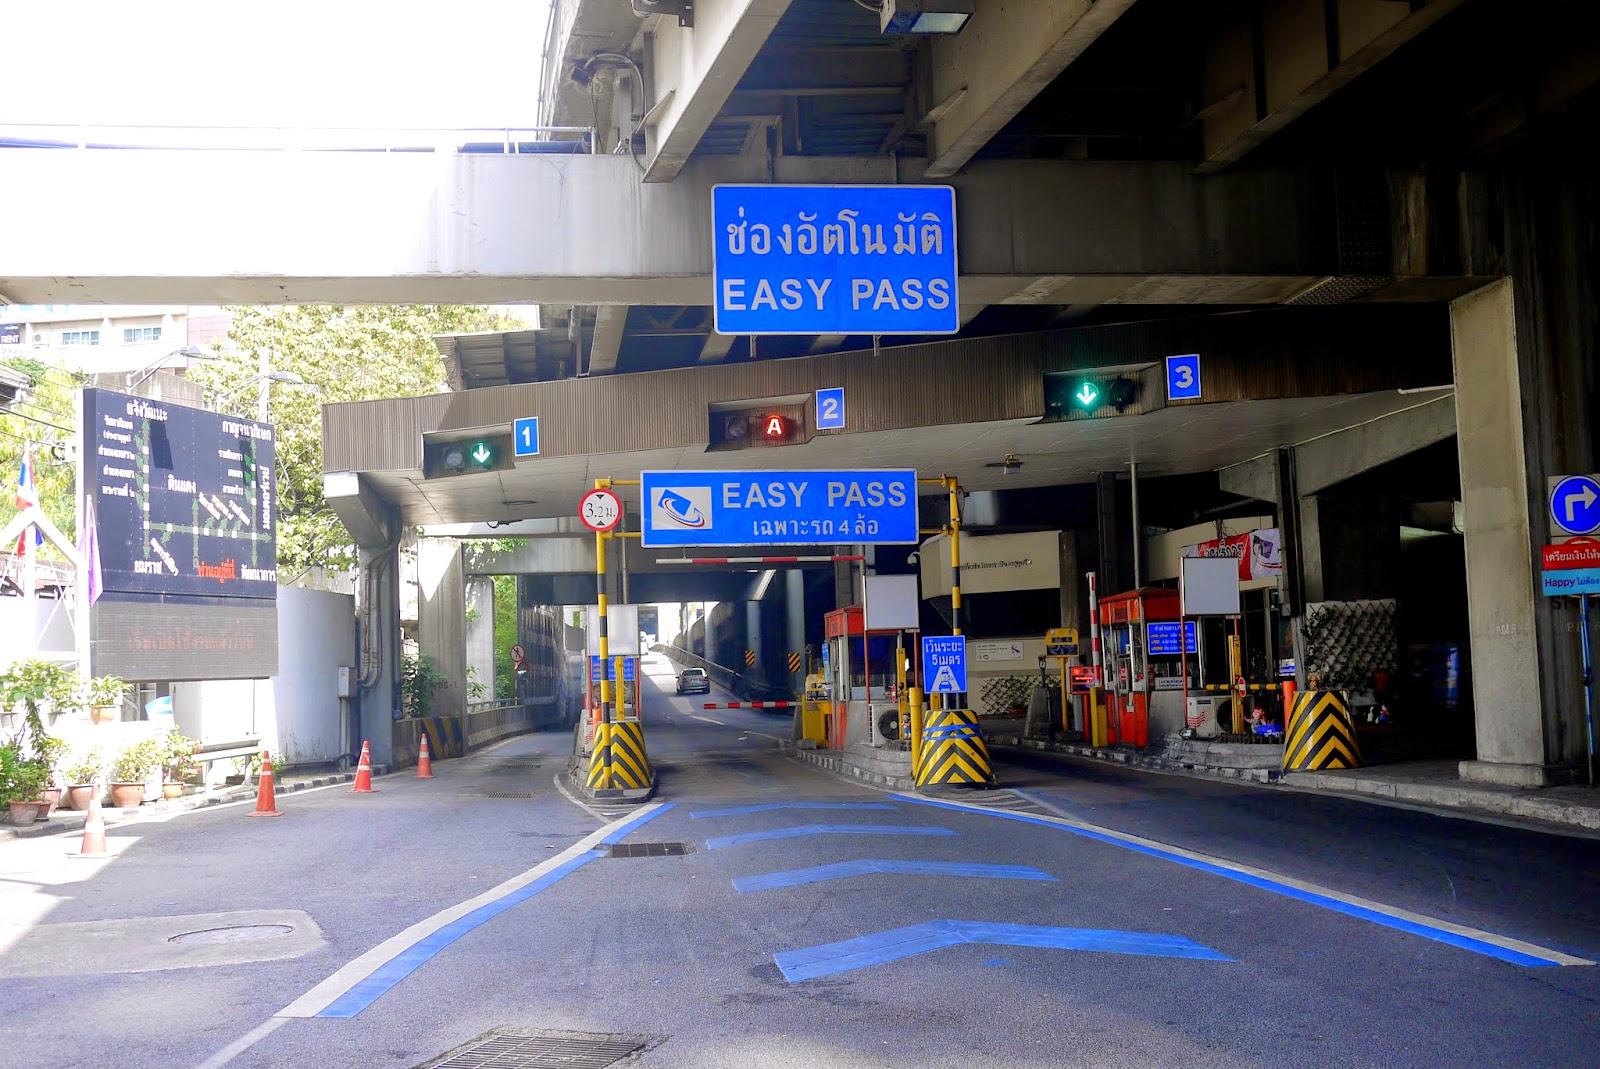 2015 Trip To Bangkok Final Day MBK Mall Chatuchak Padang Besar Butterworth Kl